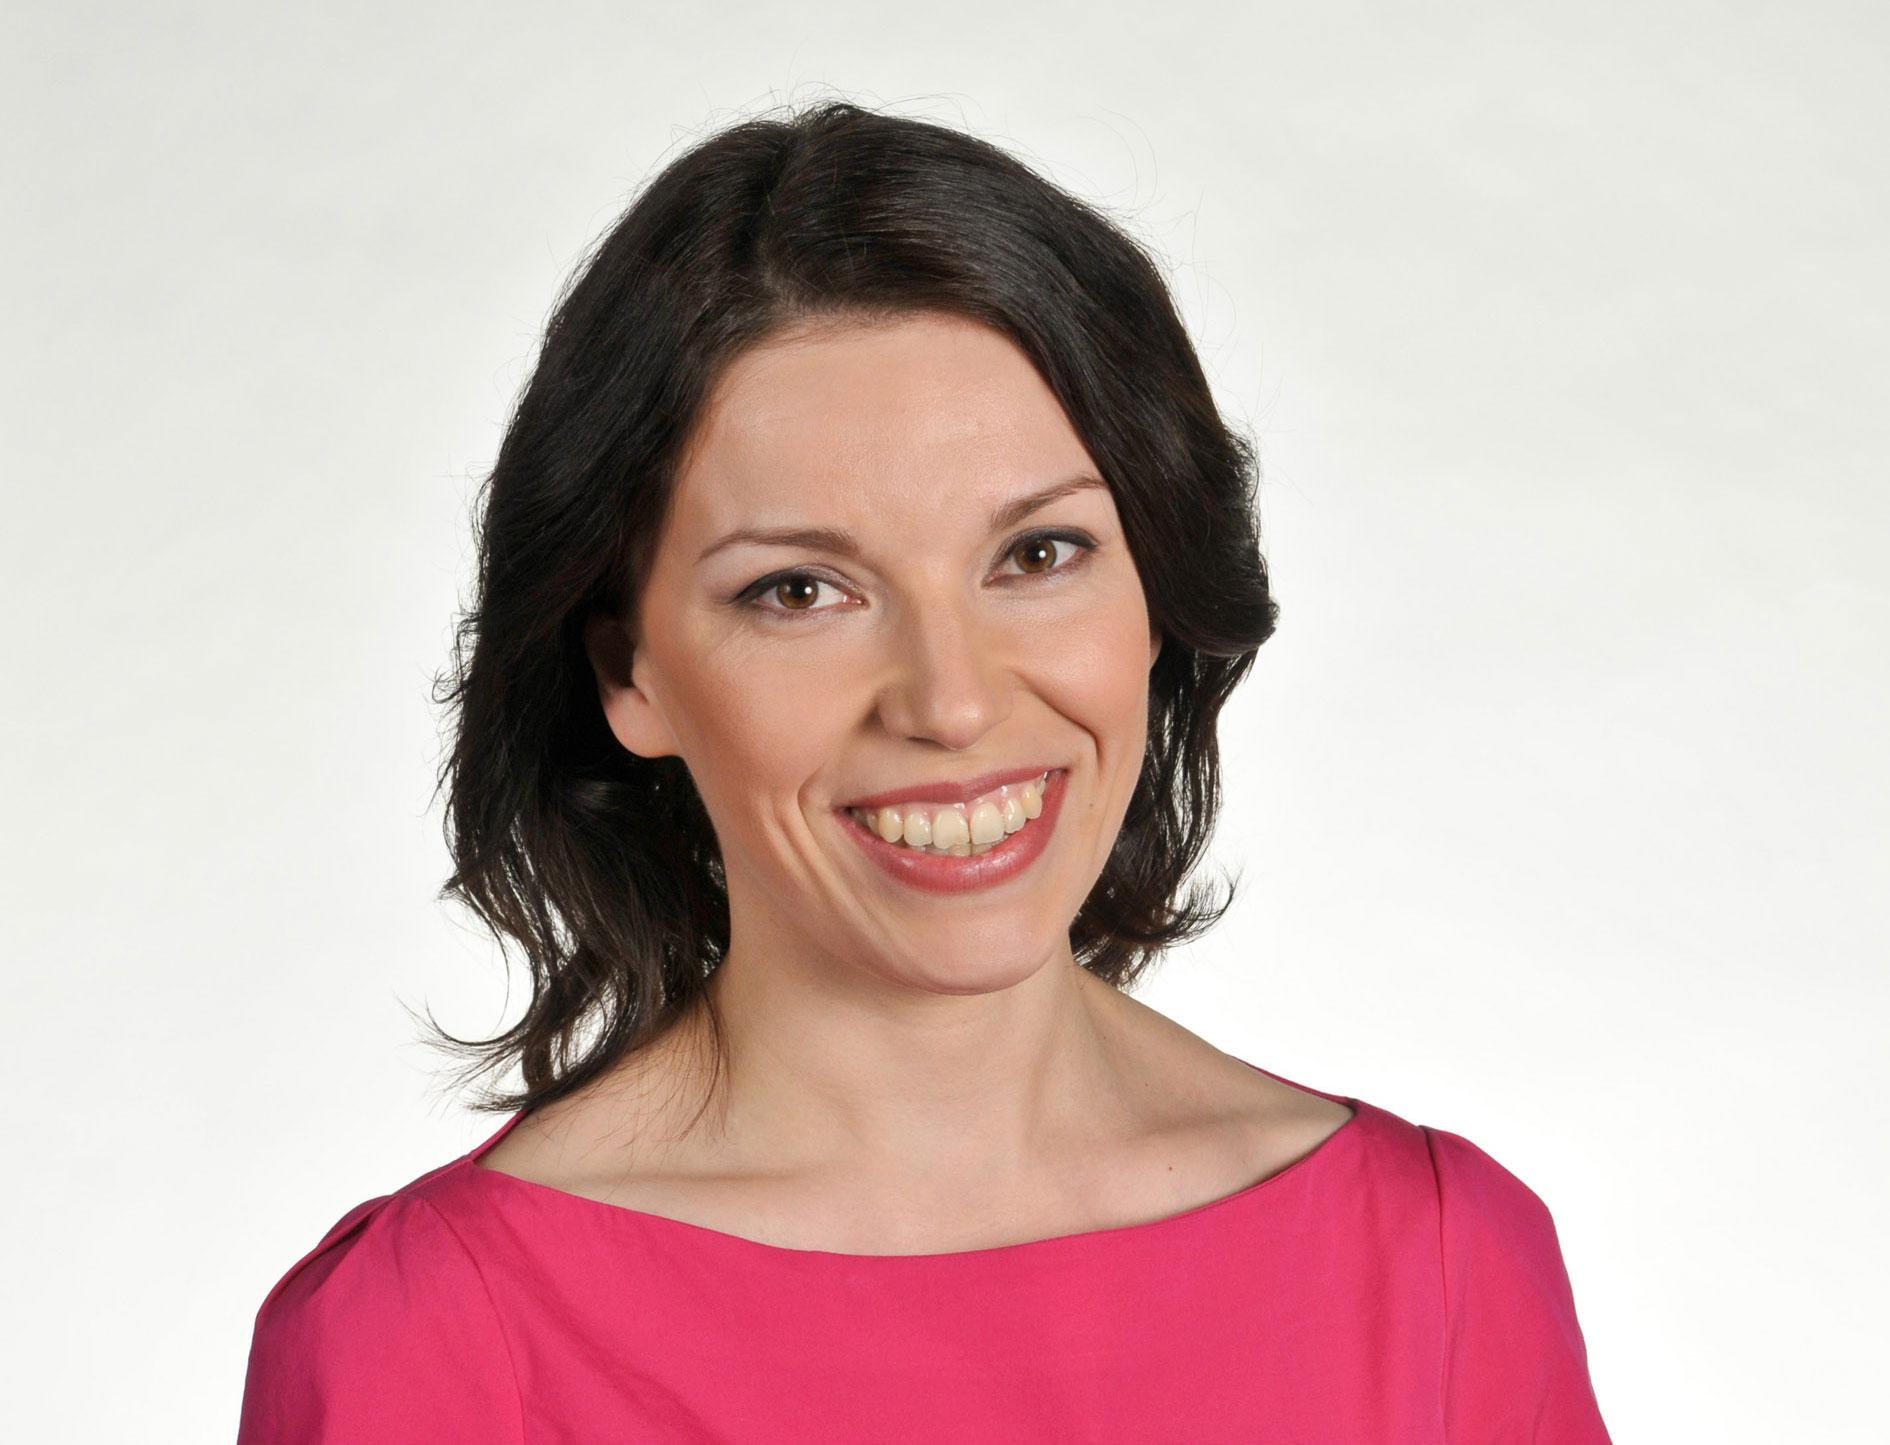 Liisa Rintaniemi